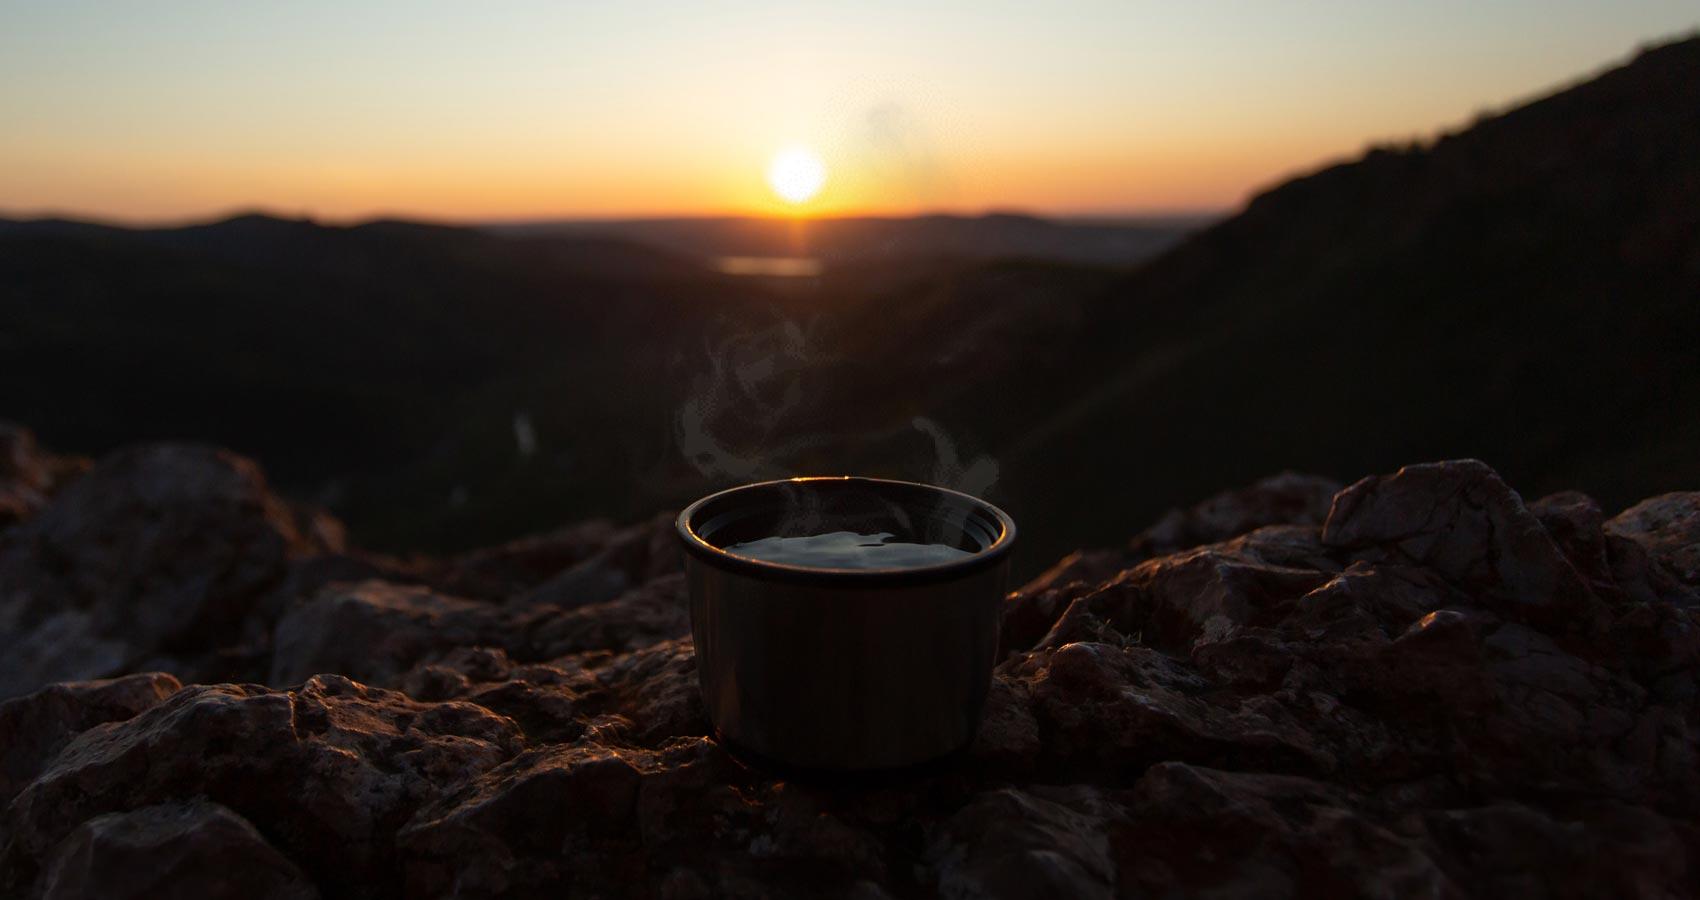 Caffeine at Dawn, a tanka by RJ Tungsten at Spillwords.com